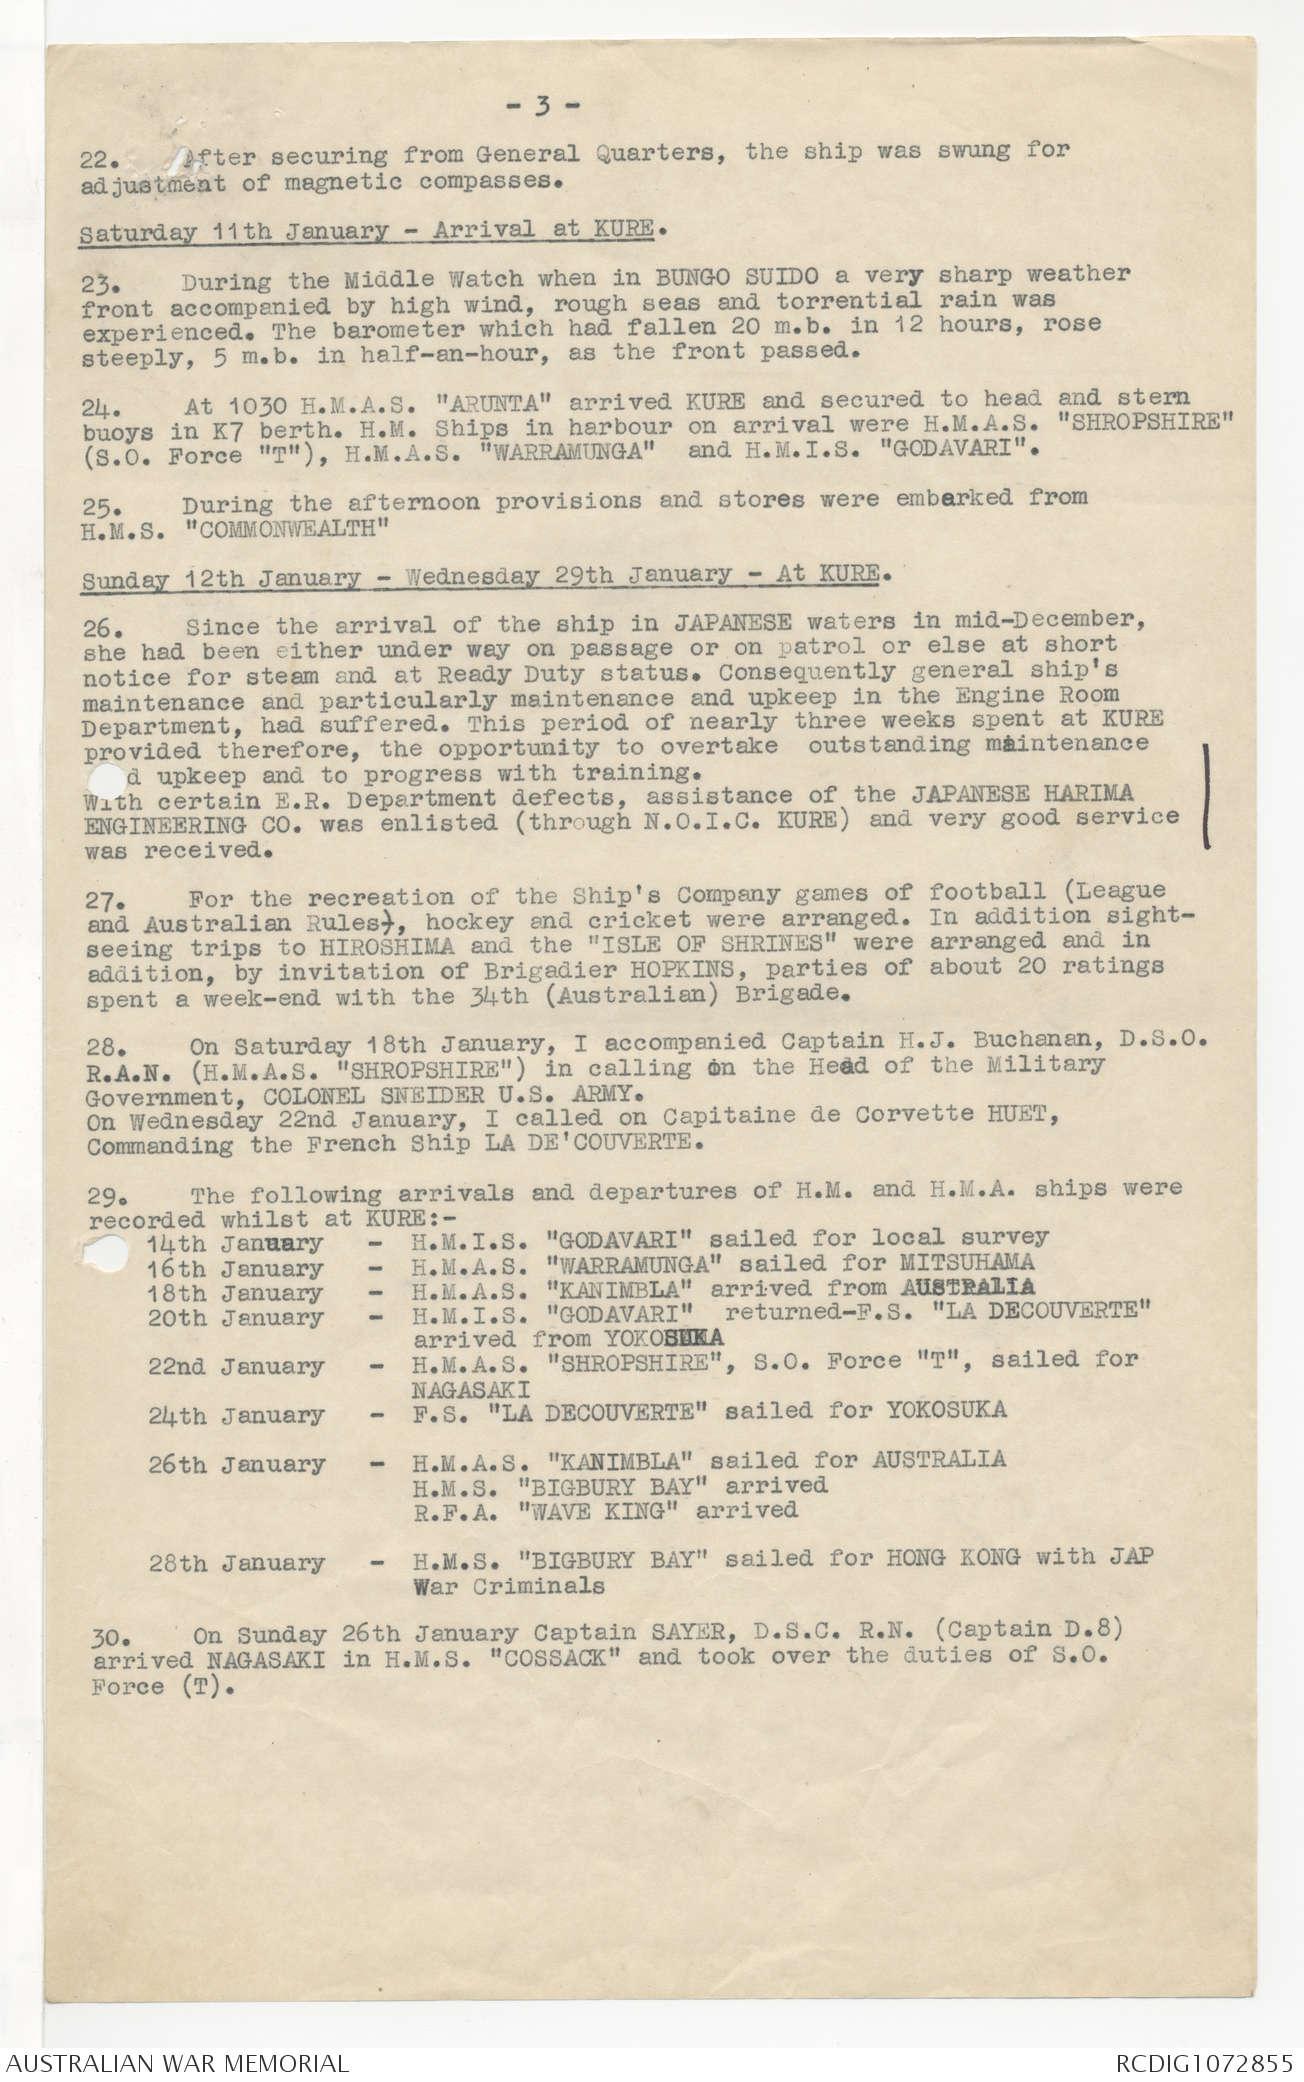 AWM78 40/1 PART 2 - April 1942 - June 1947 | The Australian